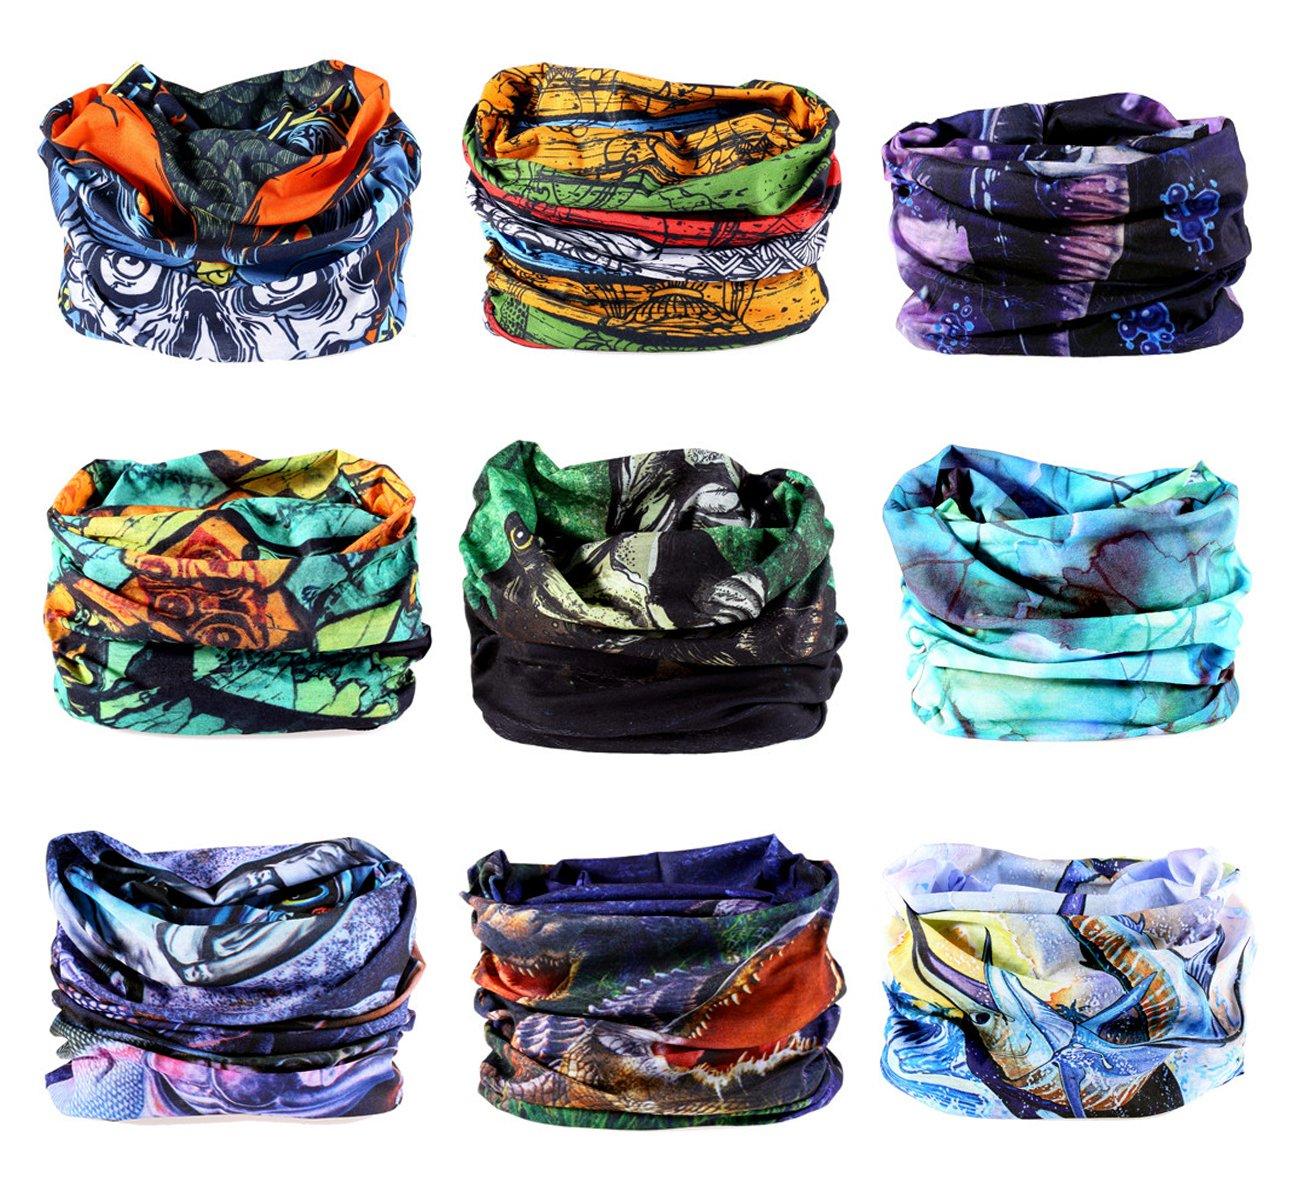 KINGREE 9PCS Headwear, Womens and Mens Headband, Guys Sweatband & Sports Head Tie for ATV/UTV Riding, Outdoor Magic Scarf, Bandanna Headwrap, (Fishing)